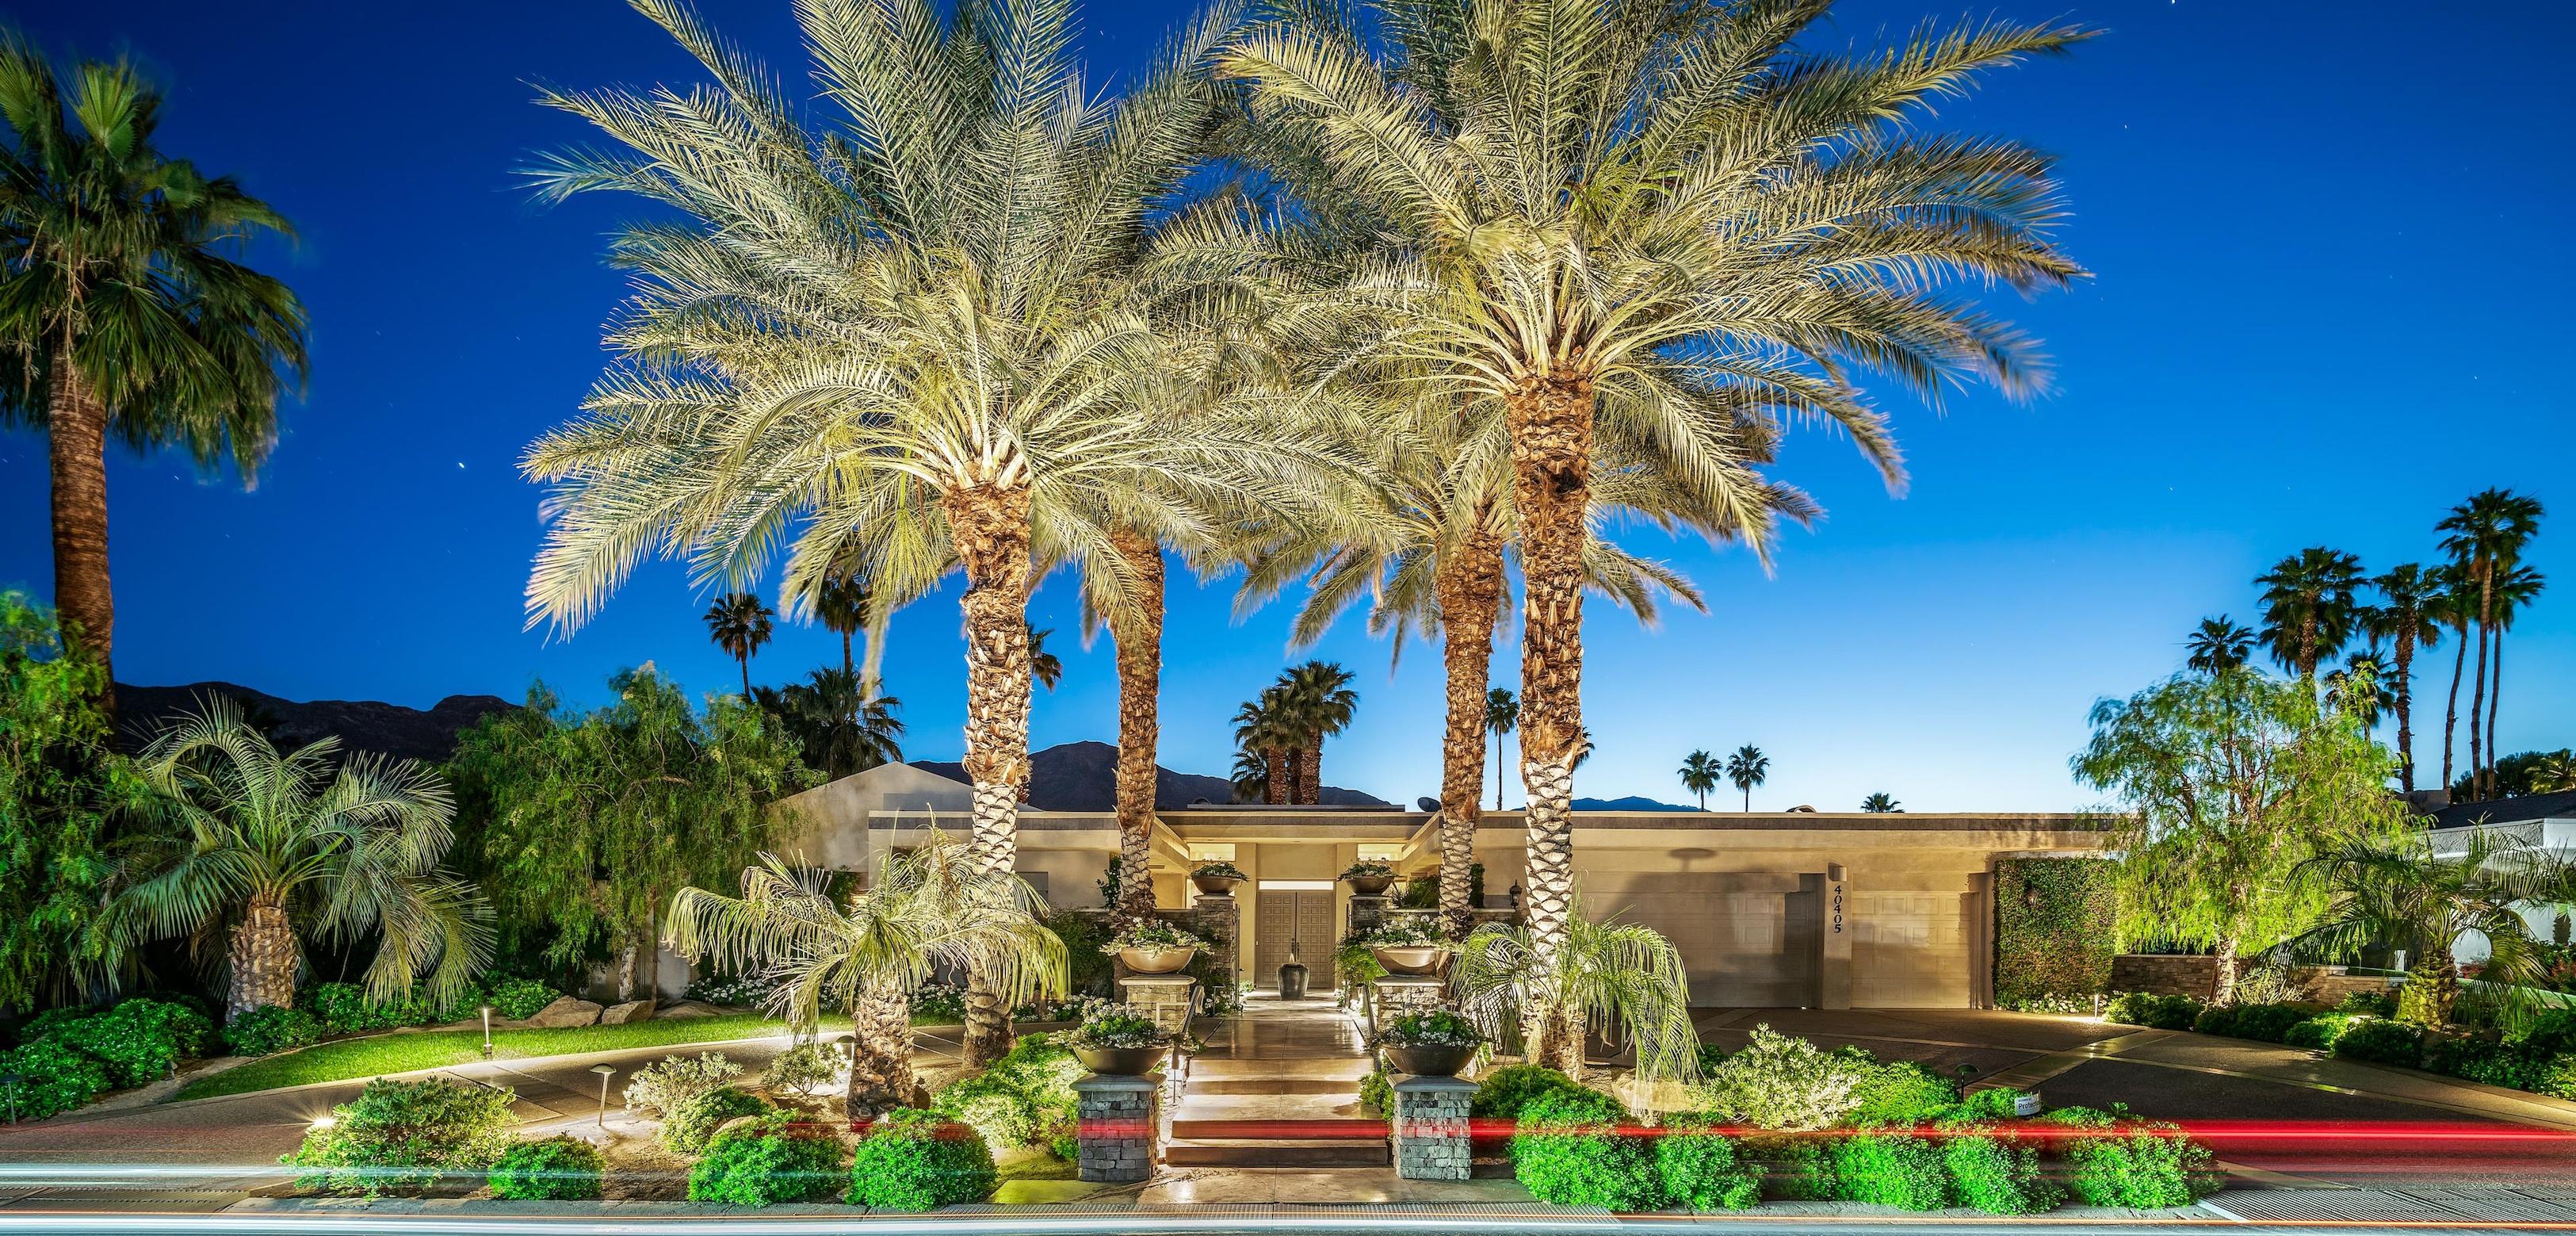 40405 Paxton Dr | Rancho Mirage, CA | $1,099,000